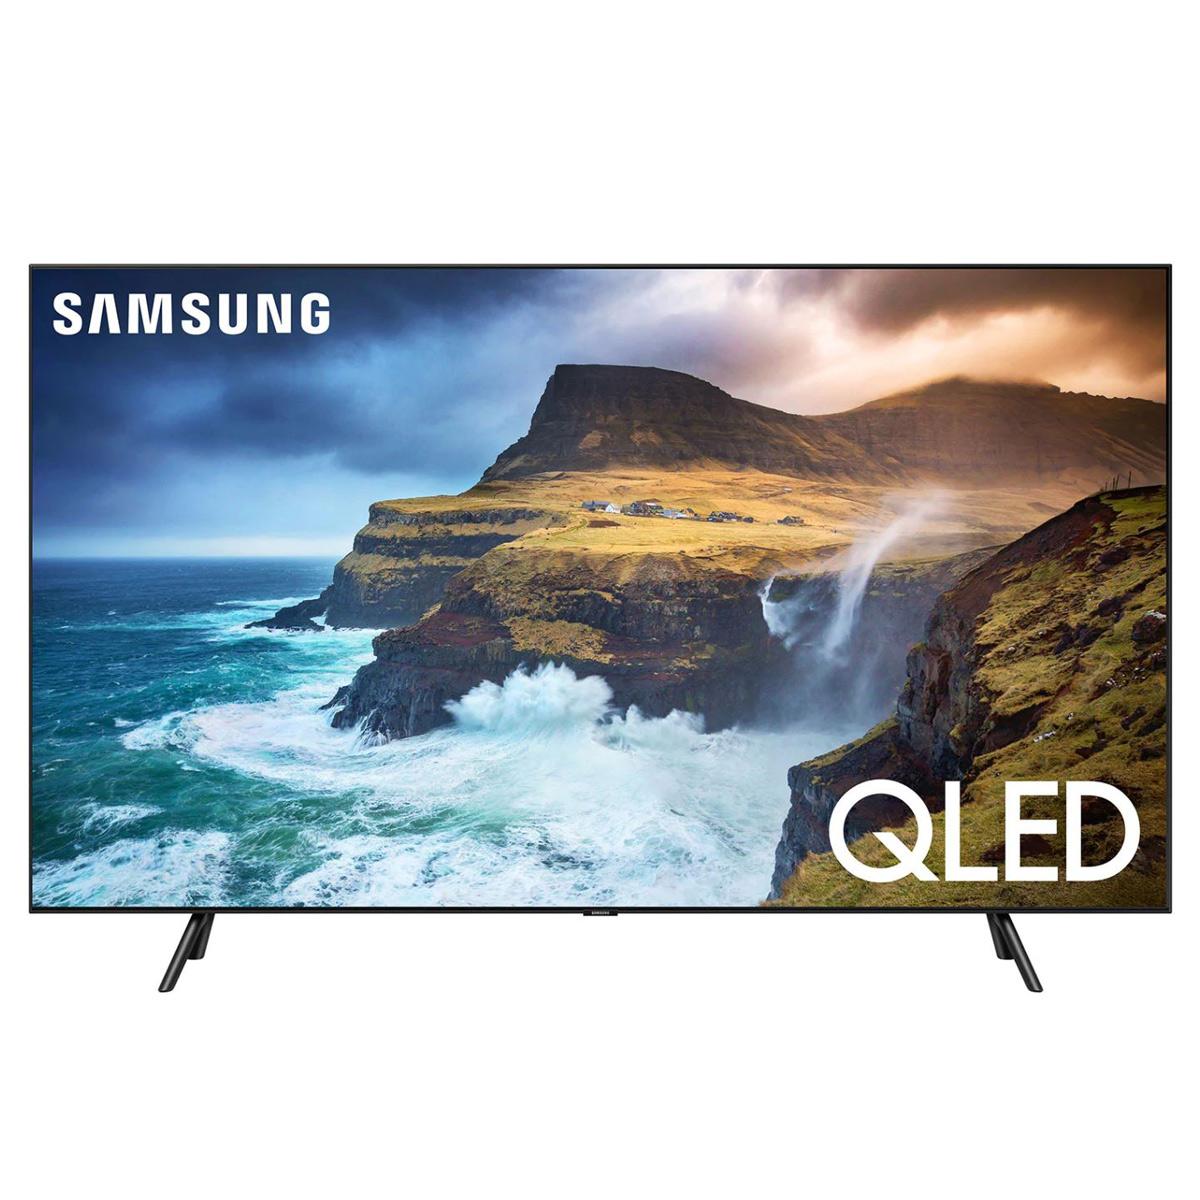 "SAMSUNG 75"" Class 4K Ultra HD (2160P) HDR Smart QLED TV QN75Q70RAFXZA (2019 Model)"